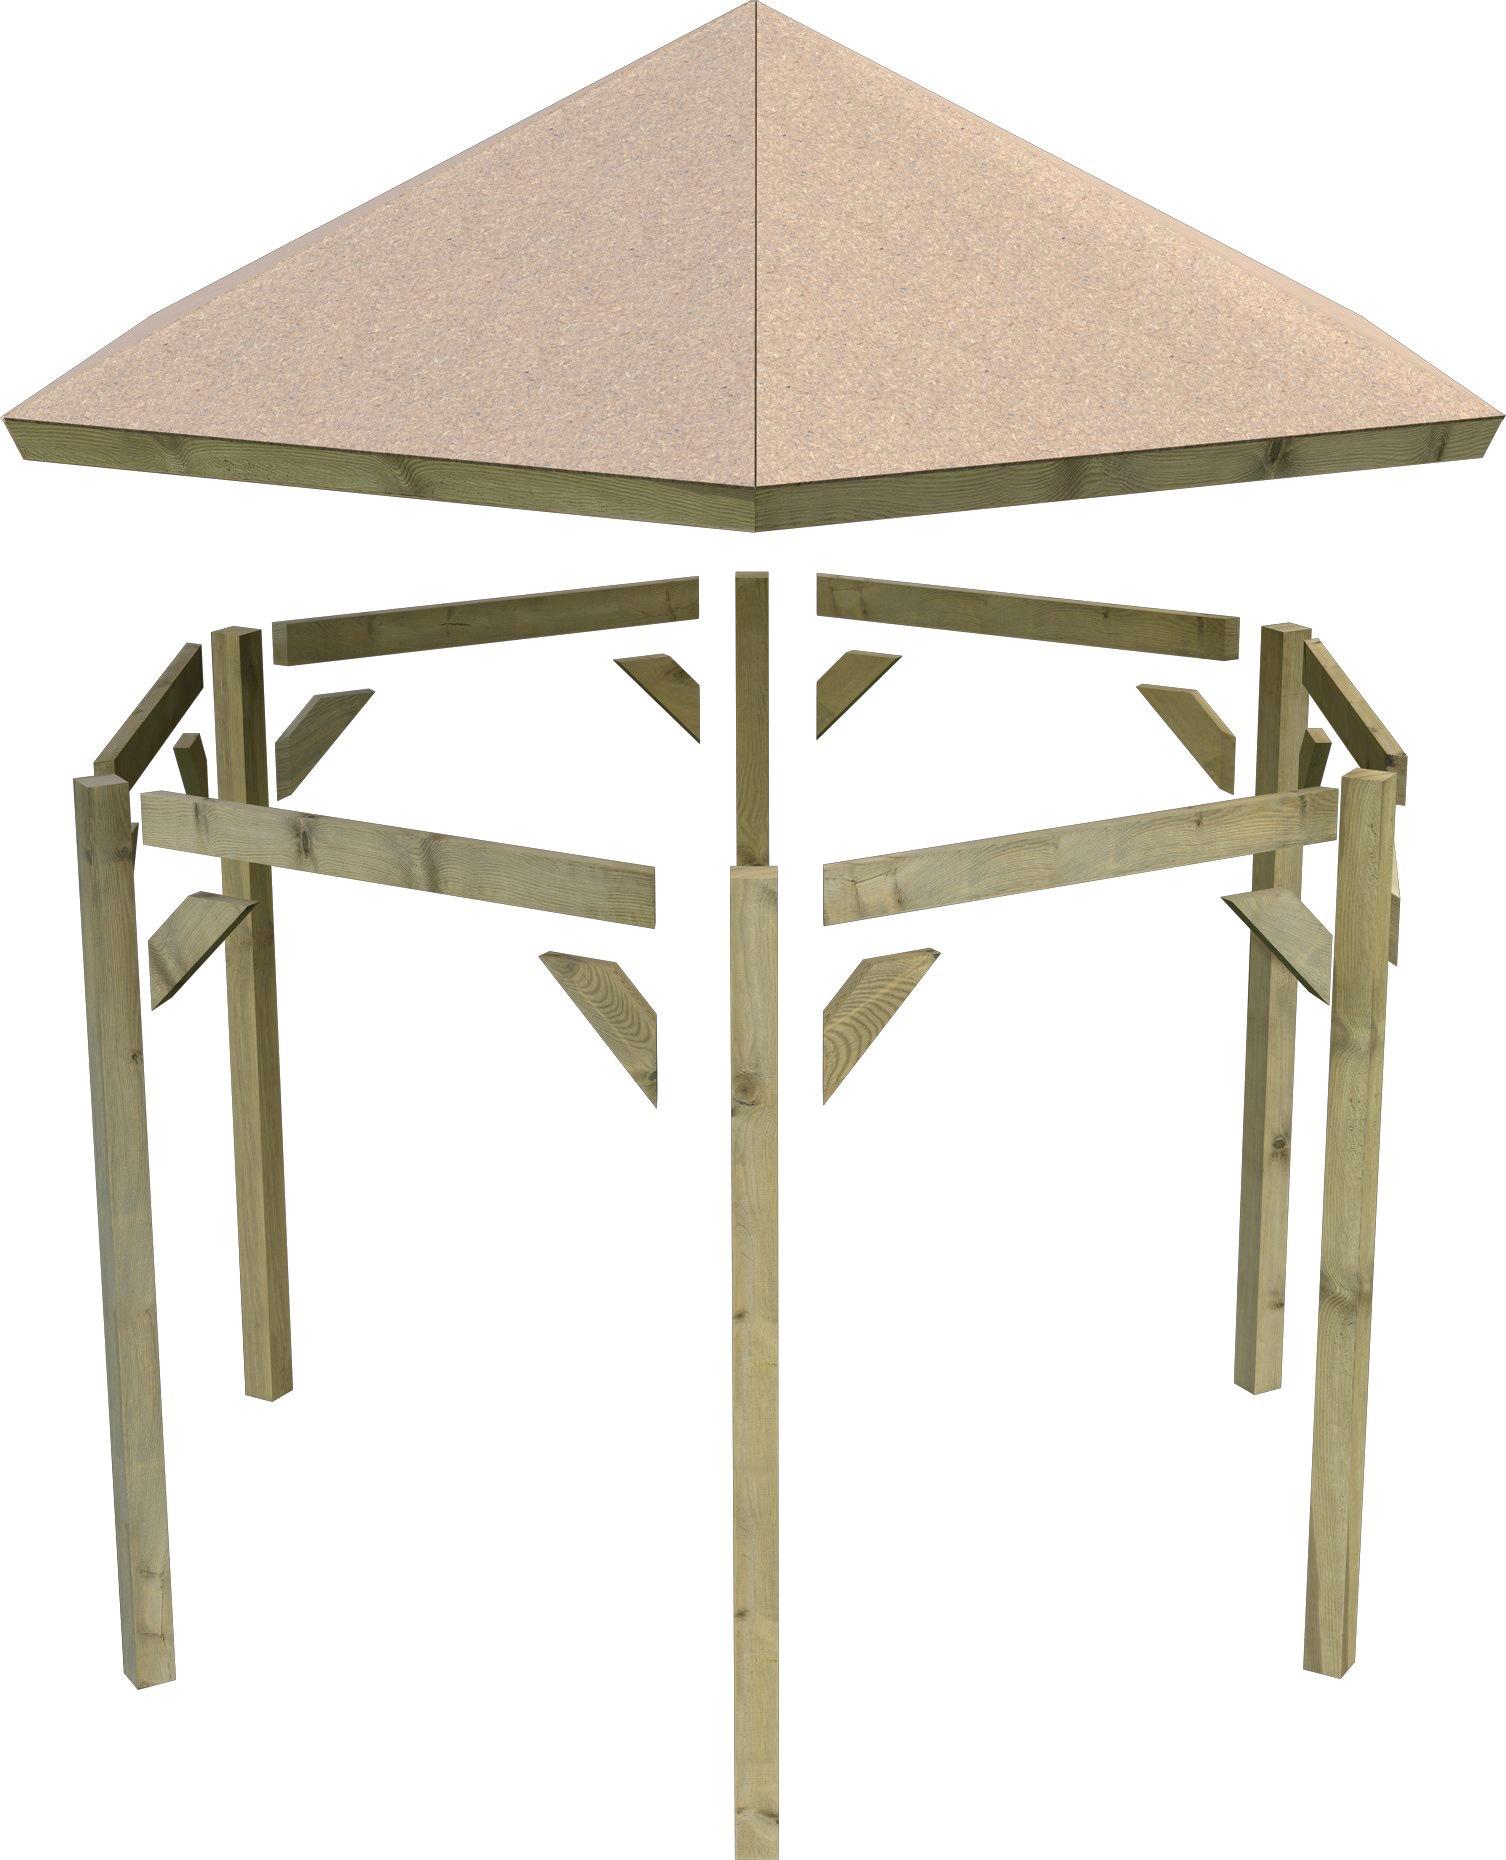 Karibu Holzpavillon Madrid, BxT: 349x302 cm günstig online kaufen